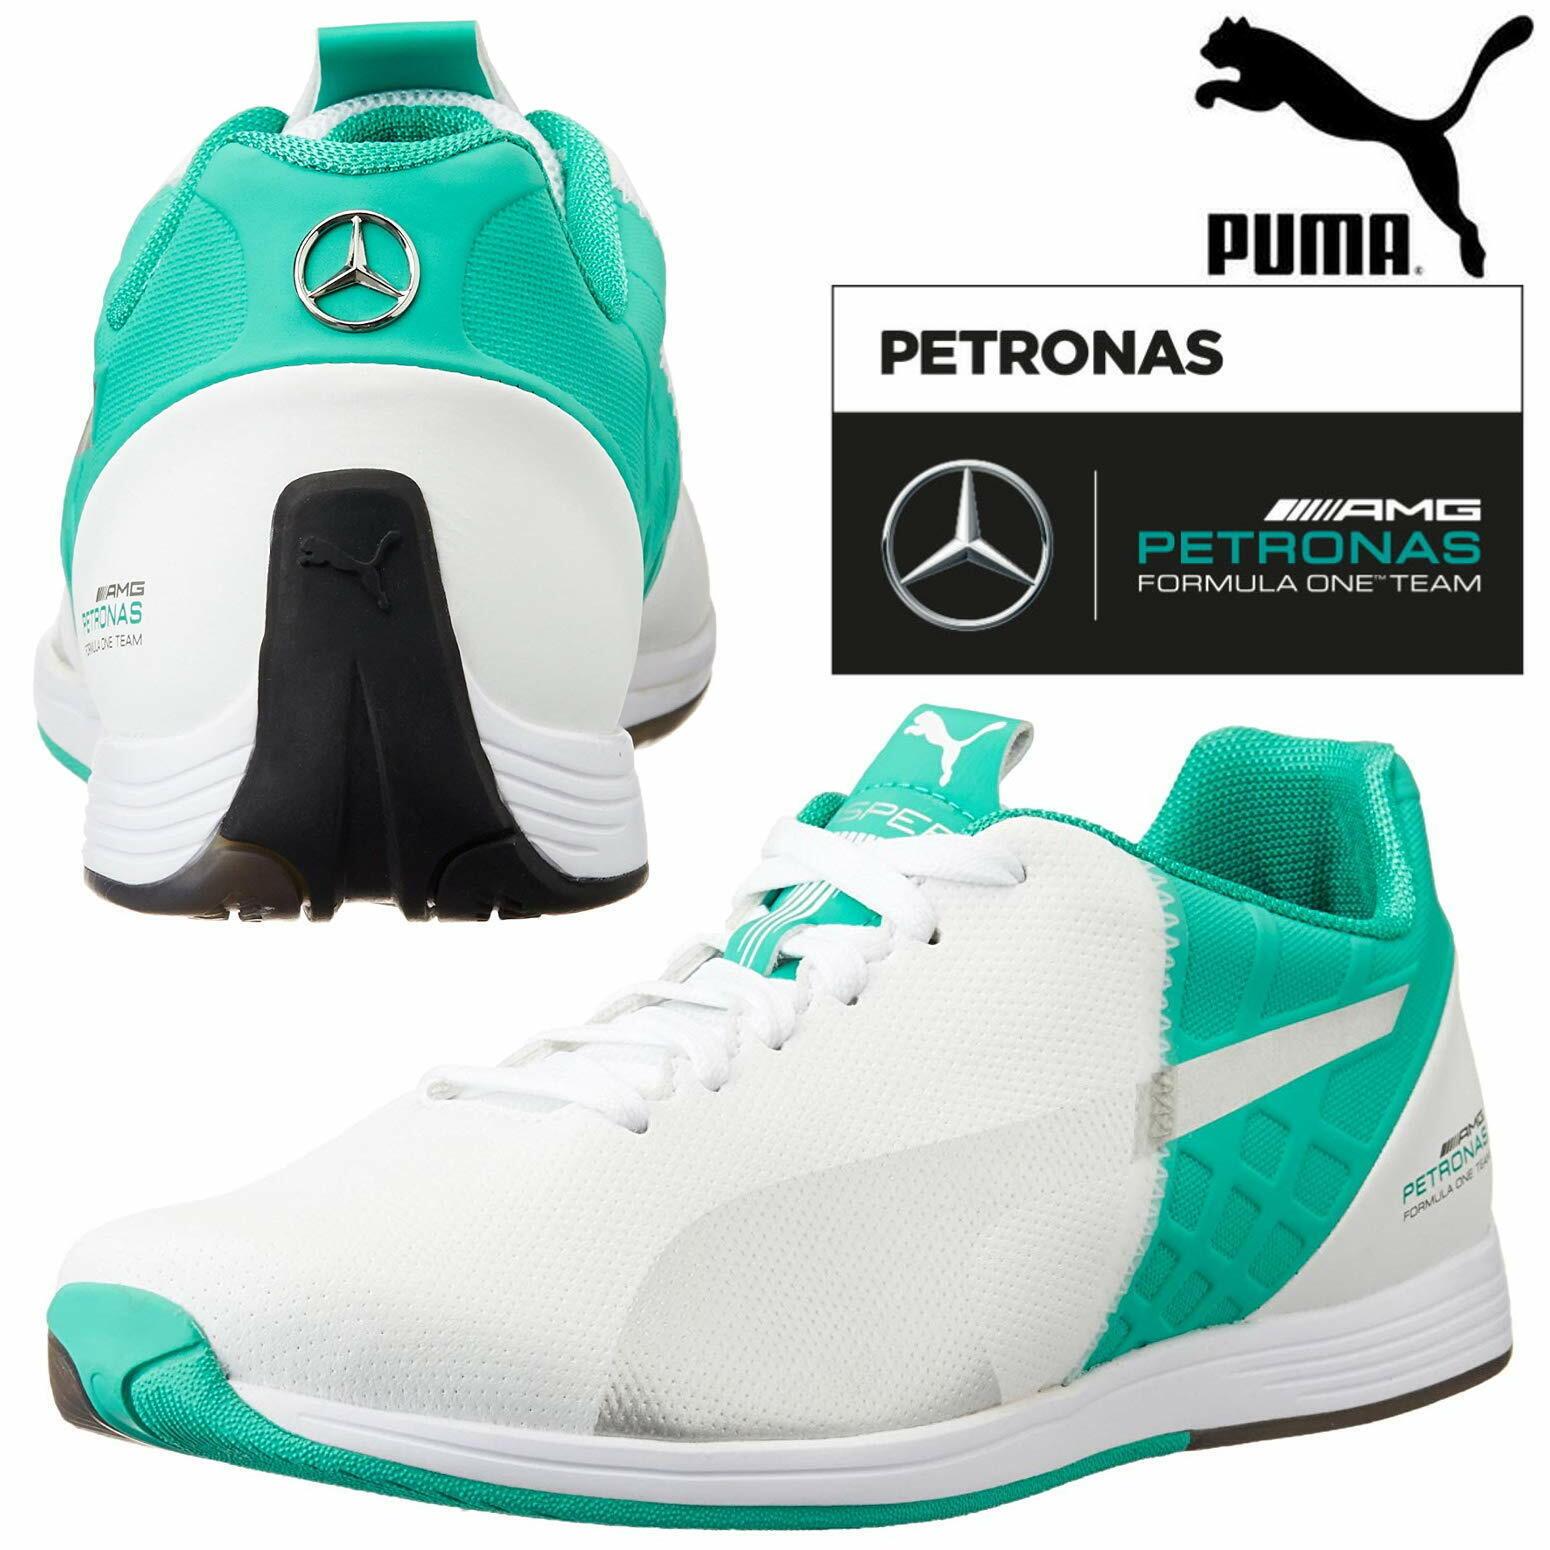 PUMA evoSPEED 1.4 Mercedes AMG Petronas MAMGP Men's Trainers Formula 1 Sneakers